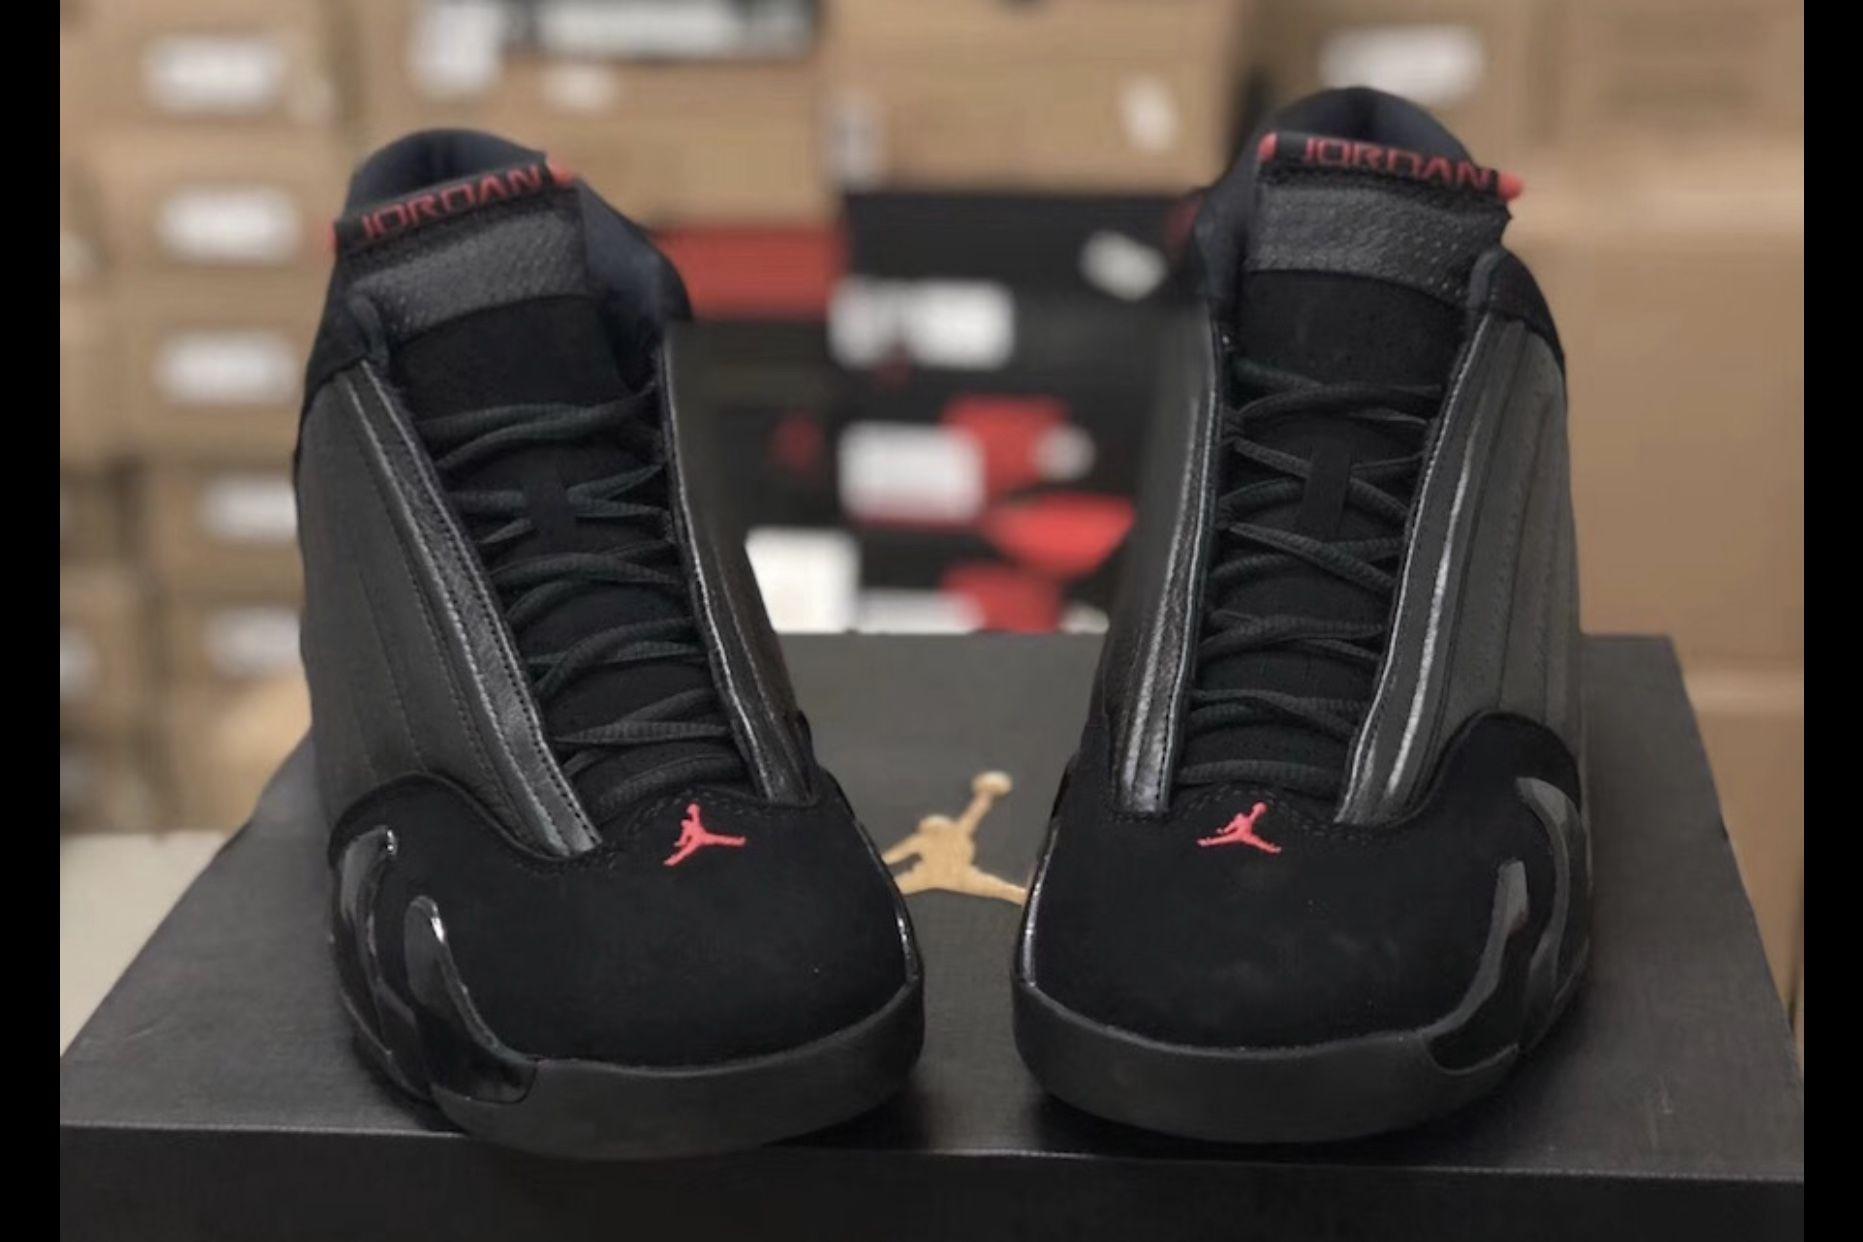 best cheap 36554 6d2a7 Men's Jordan Retro 14 - Black, Varsity Red, Black - 87471003 ...